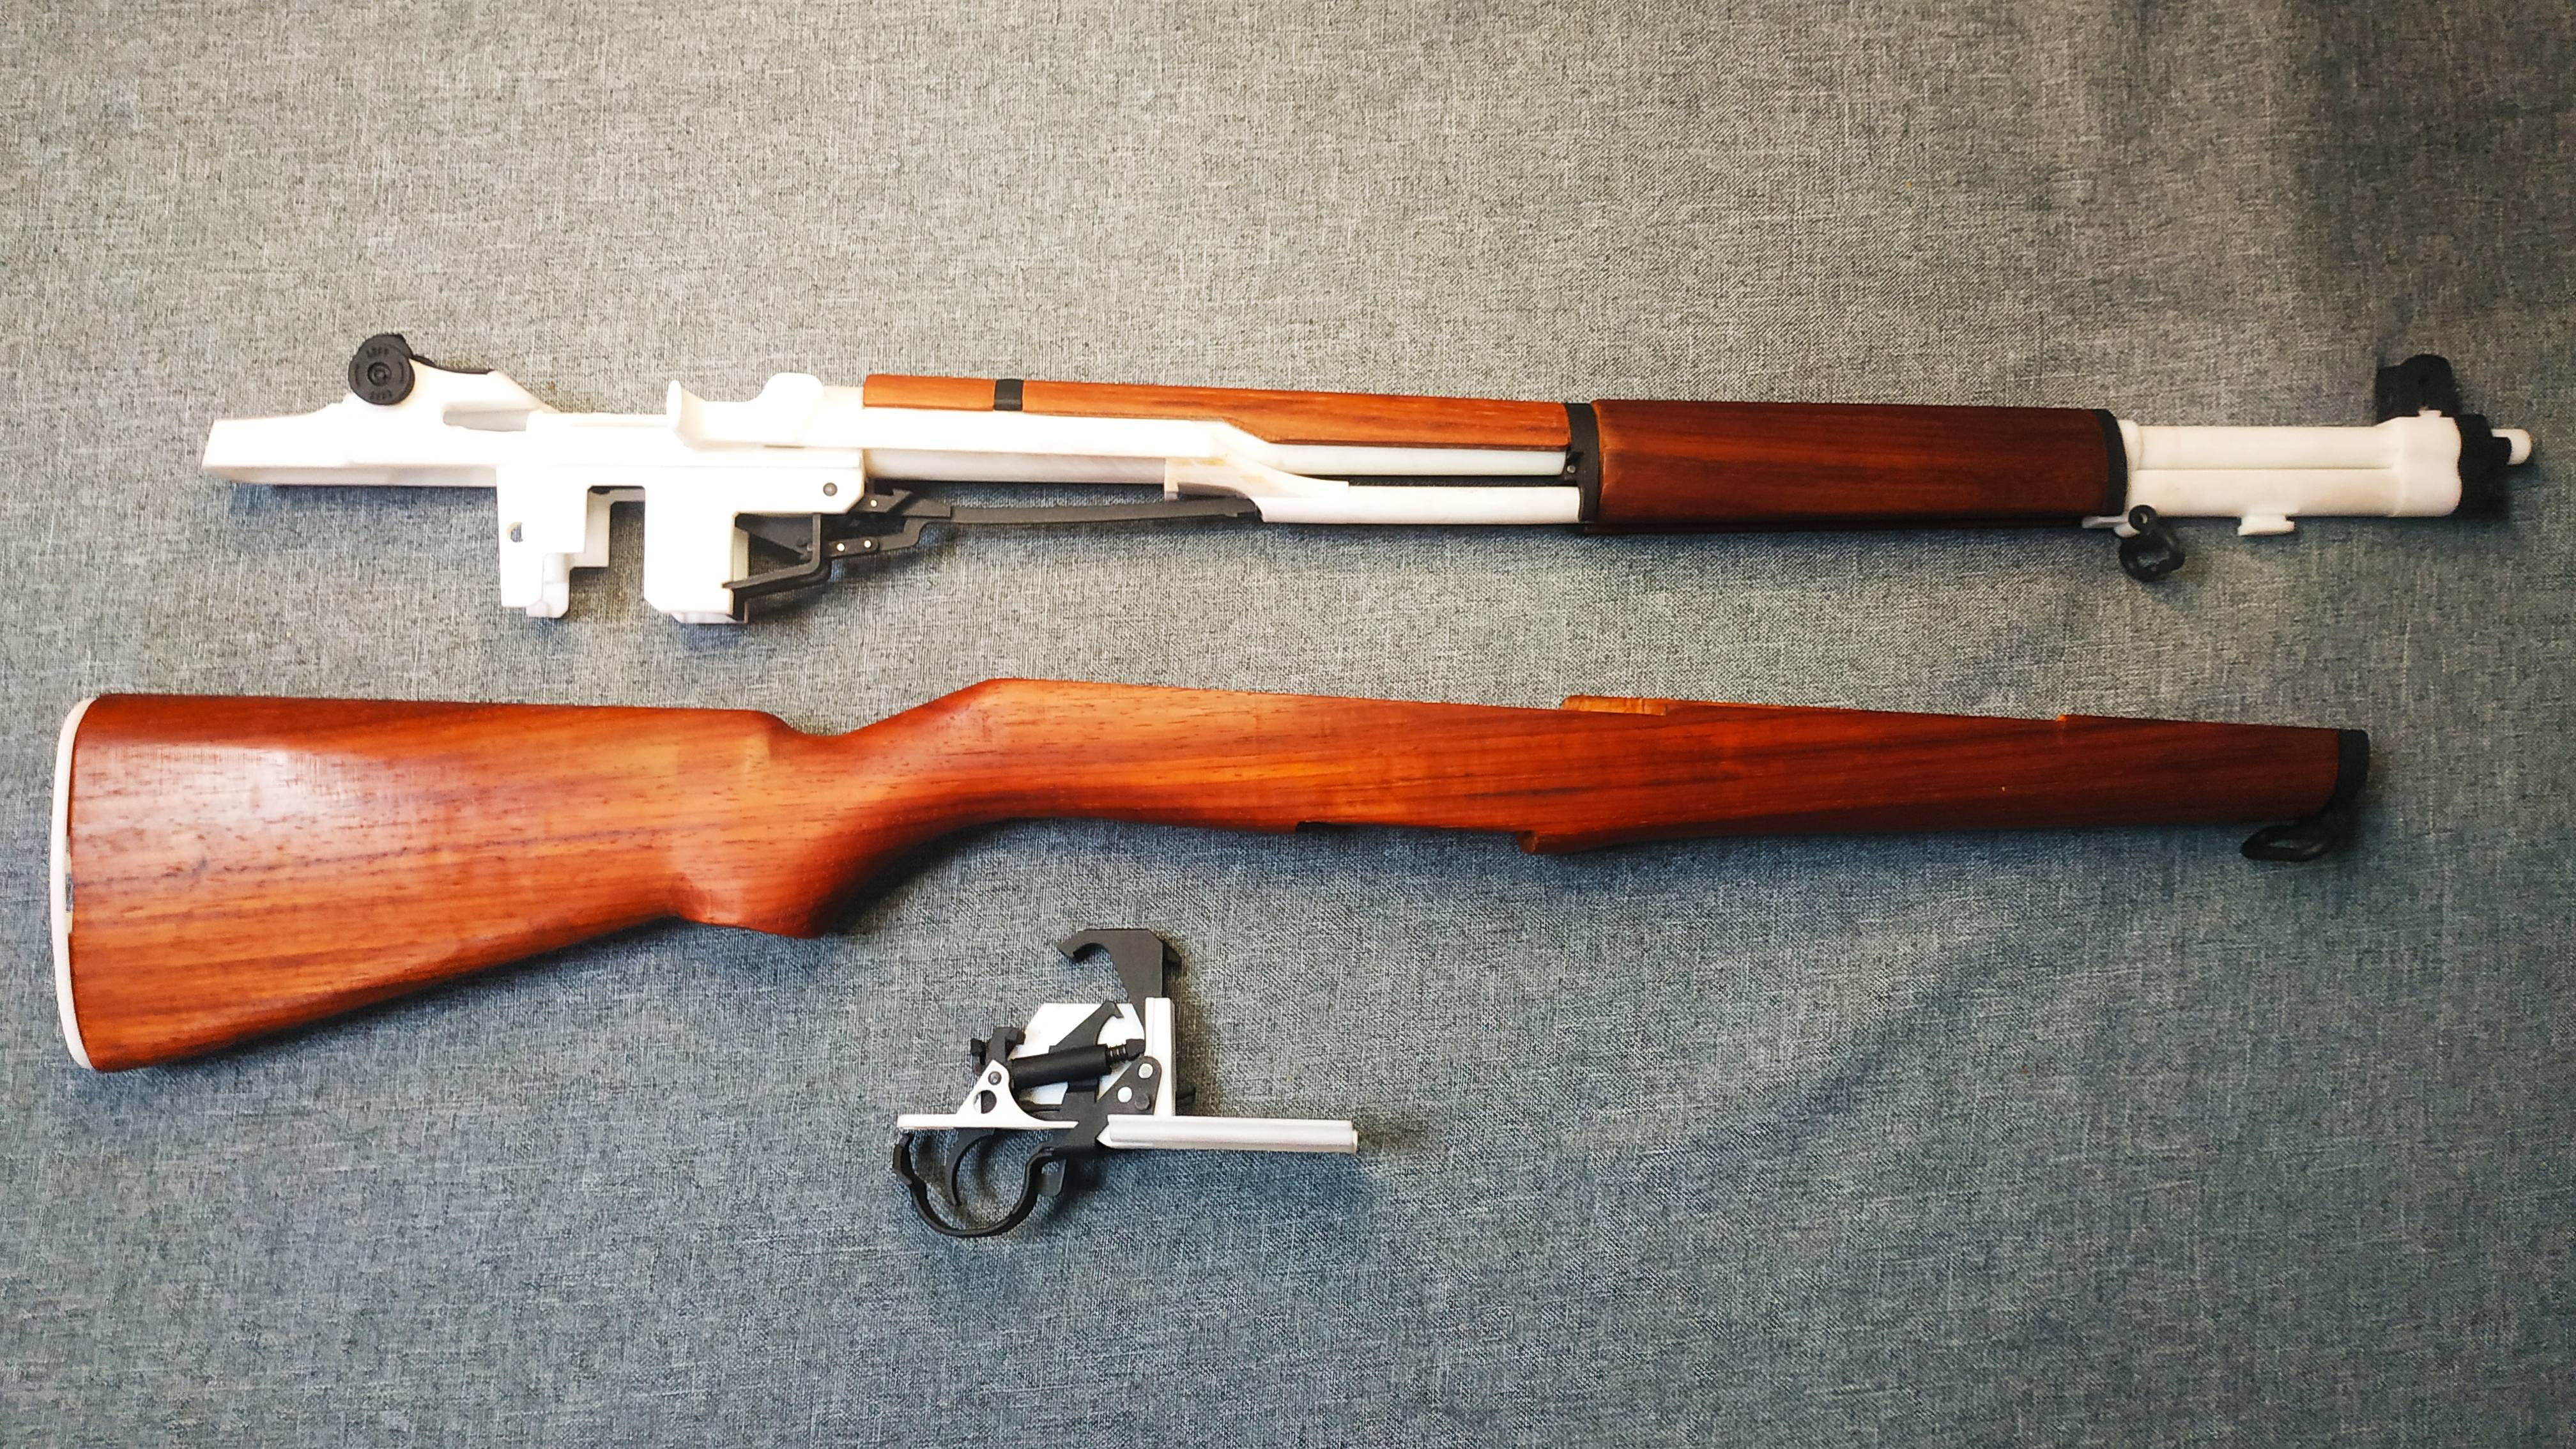 M1加兰德步枪分解与组装——3D打印不可发射塑料模型